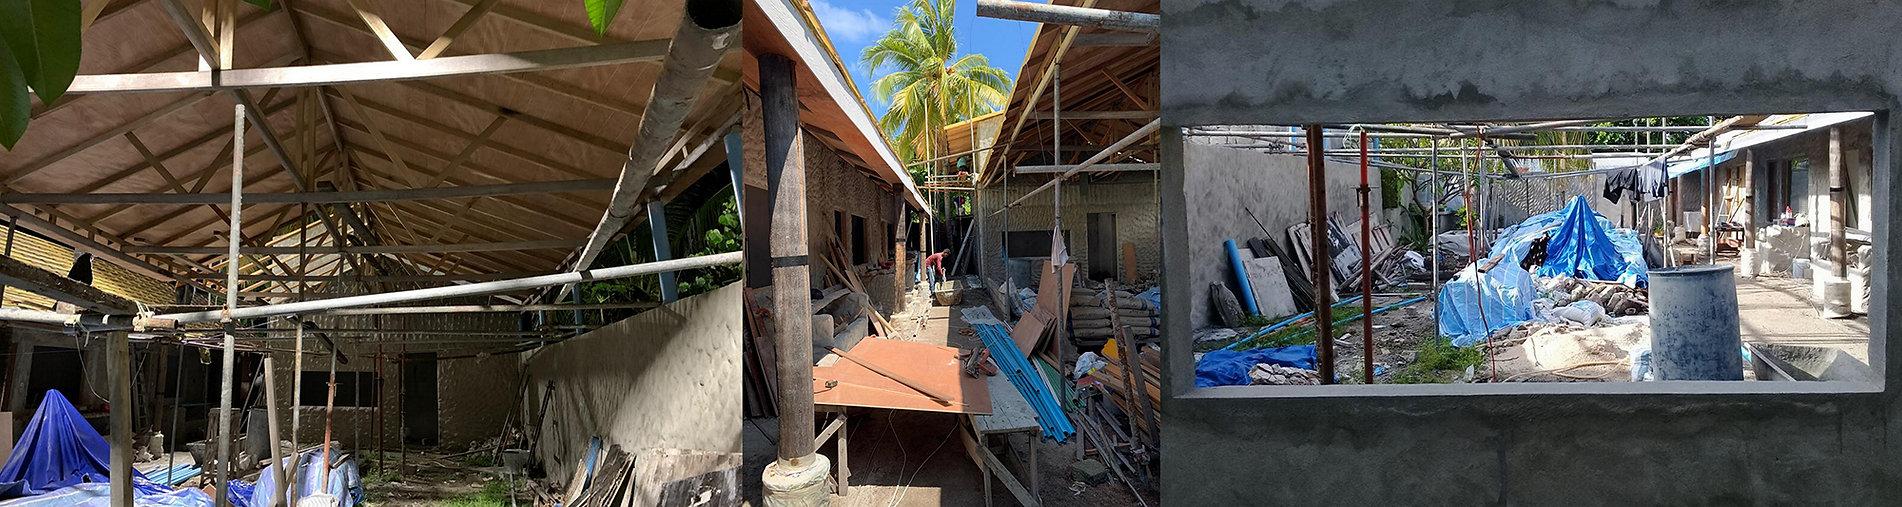 Sangu, Atholhu Residence, Fehendhoo, Maldives